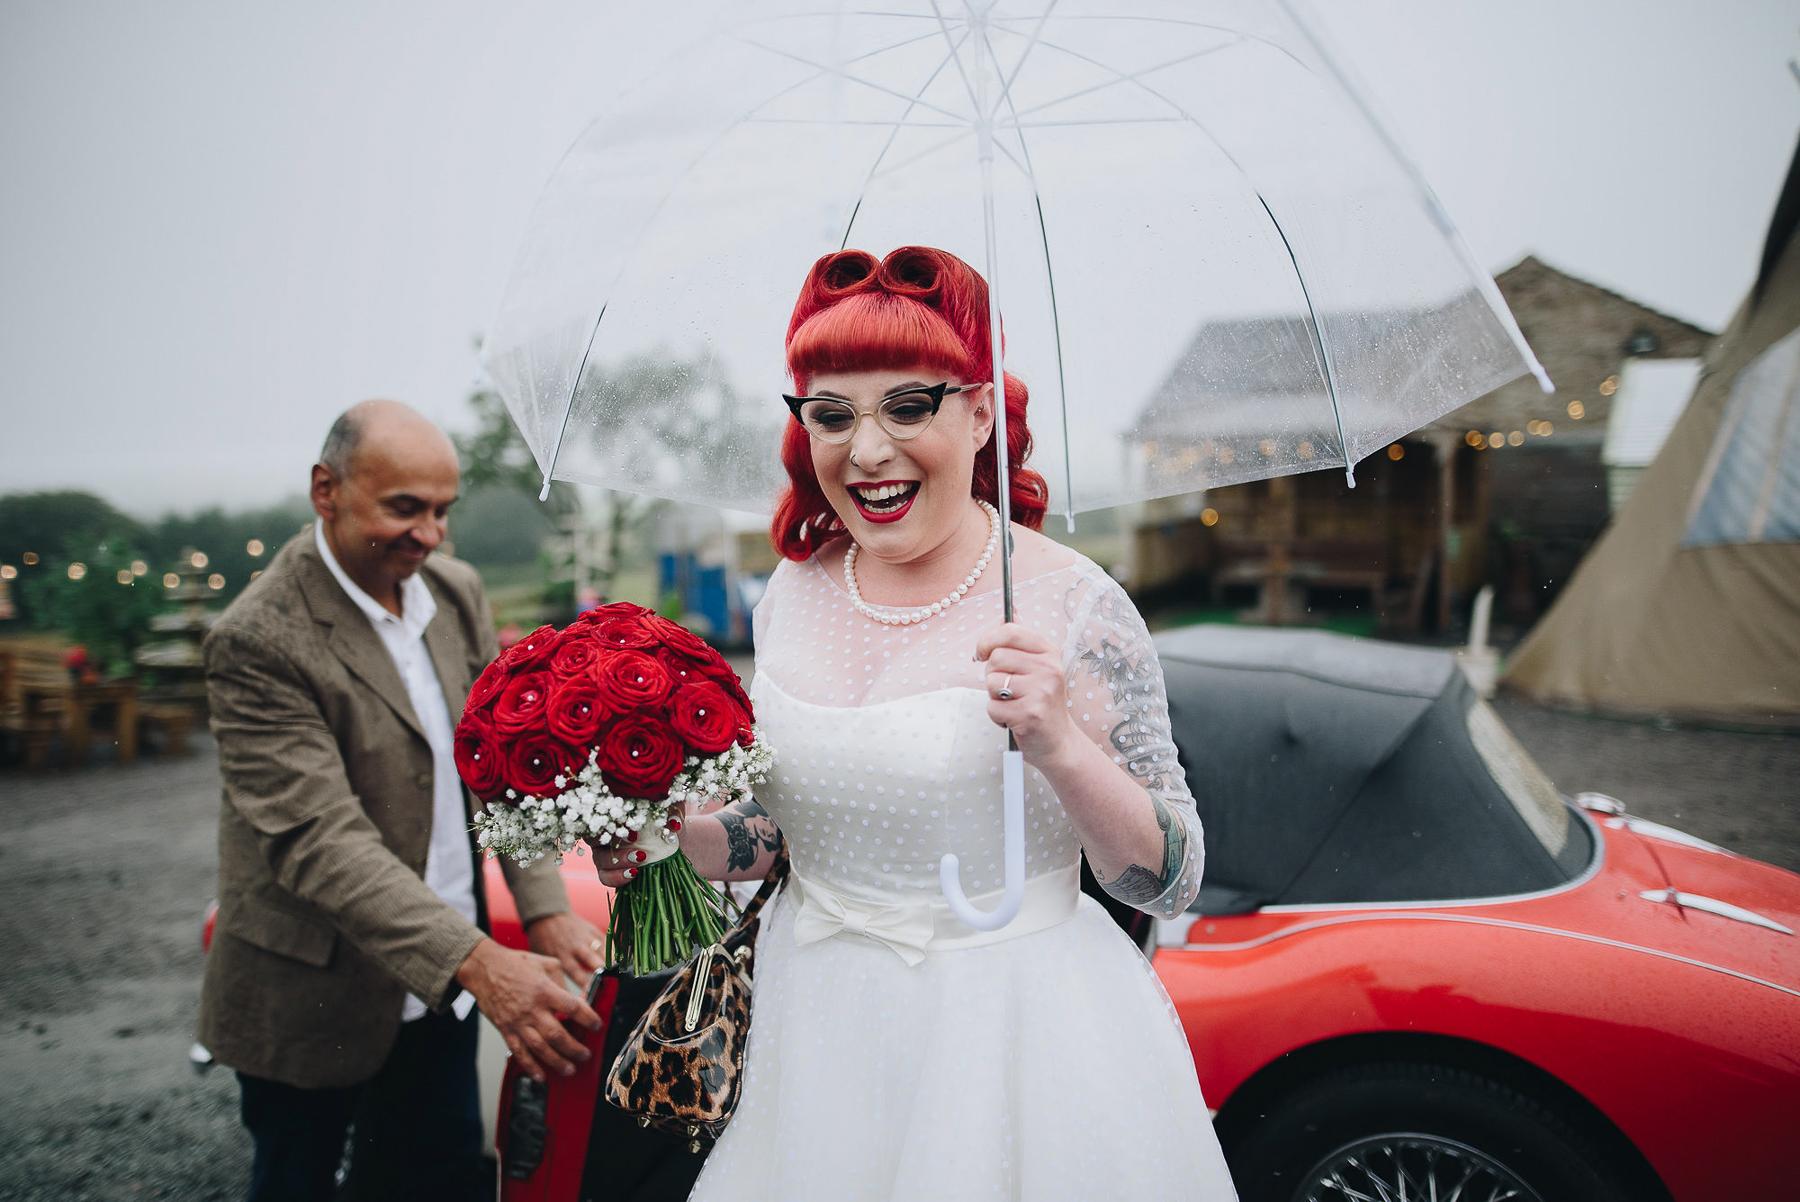 Wellbeing_Farm_Wedding_Photography_The_Pin-Up_Bride_Lara_Shaun-43.jpg